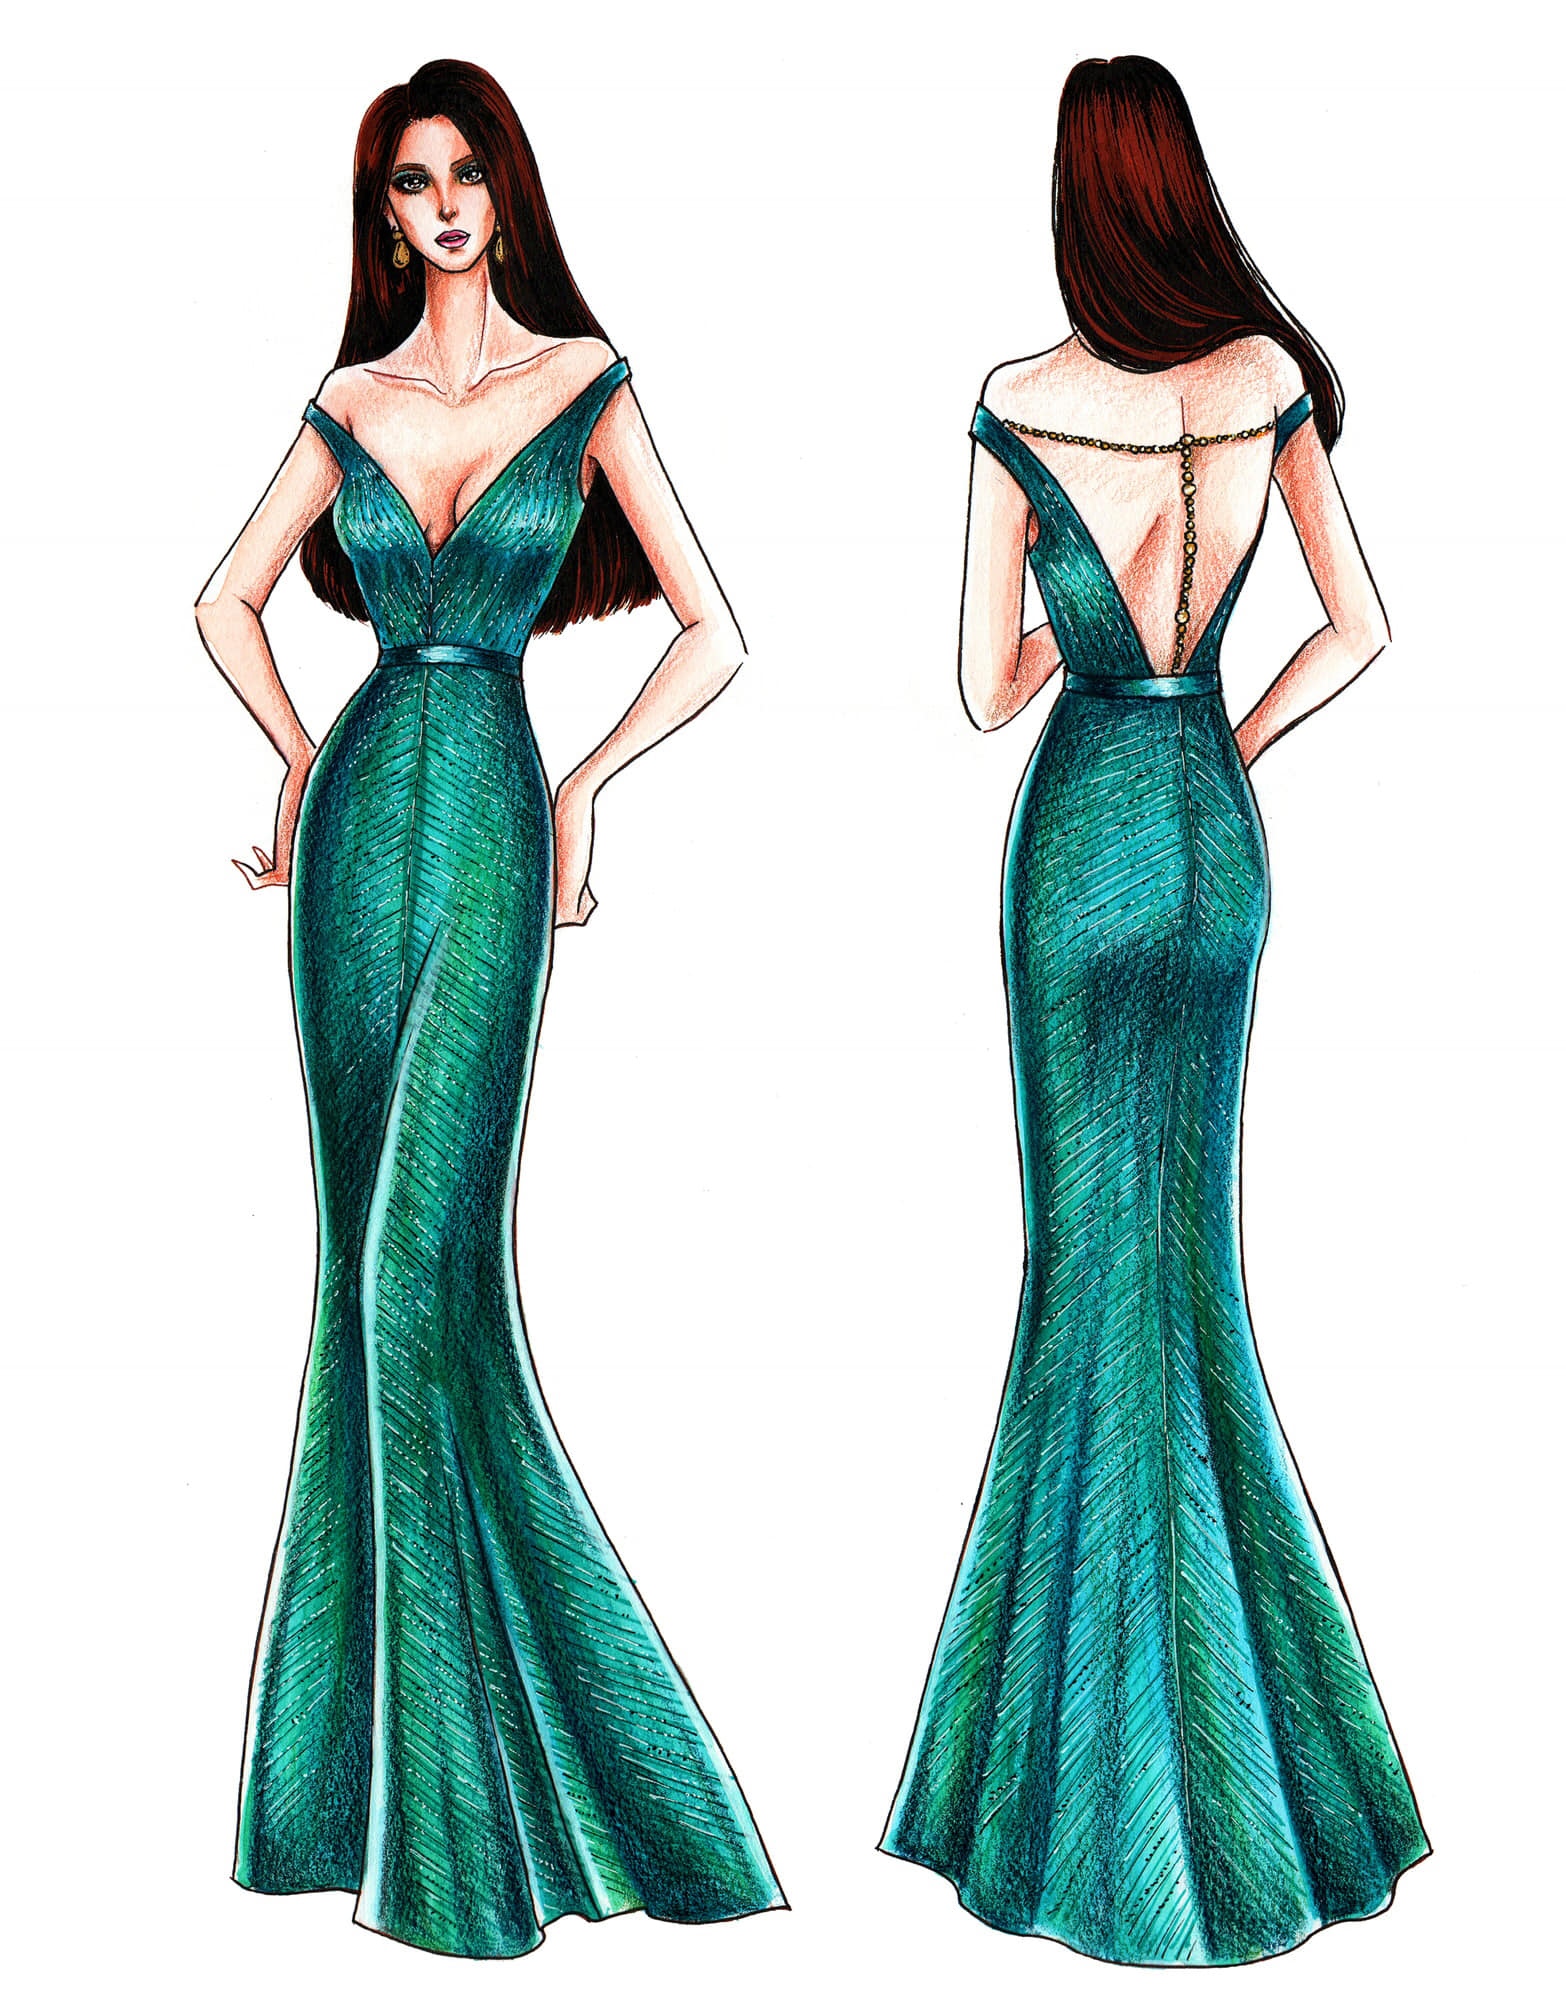 LOOK Designer Mak Tumangu0026#39;s Sketches Of Catriona Grayu0026#39;s Miss Universe 2018 Evening Gowns